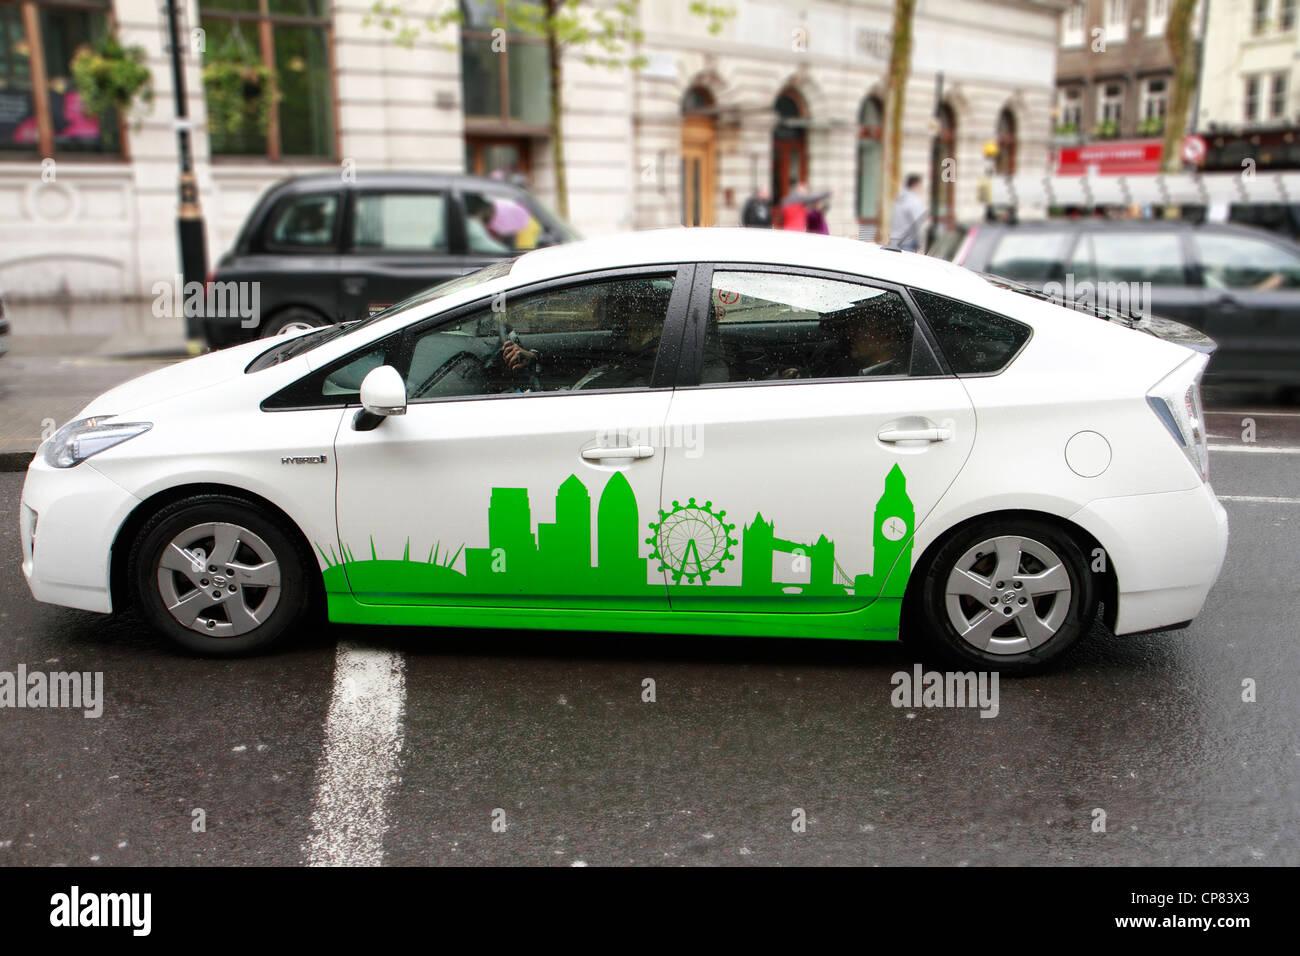 Toyota Prius minicab, London, UK - Stock Image